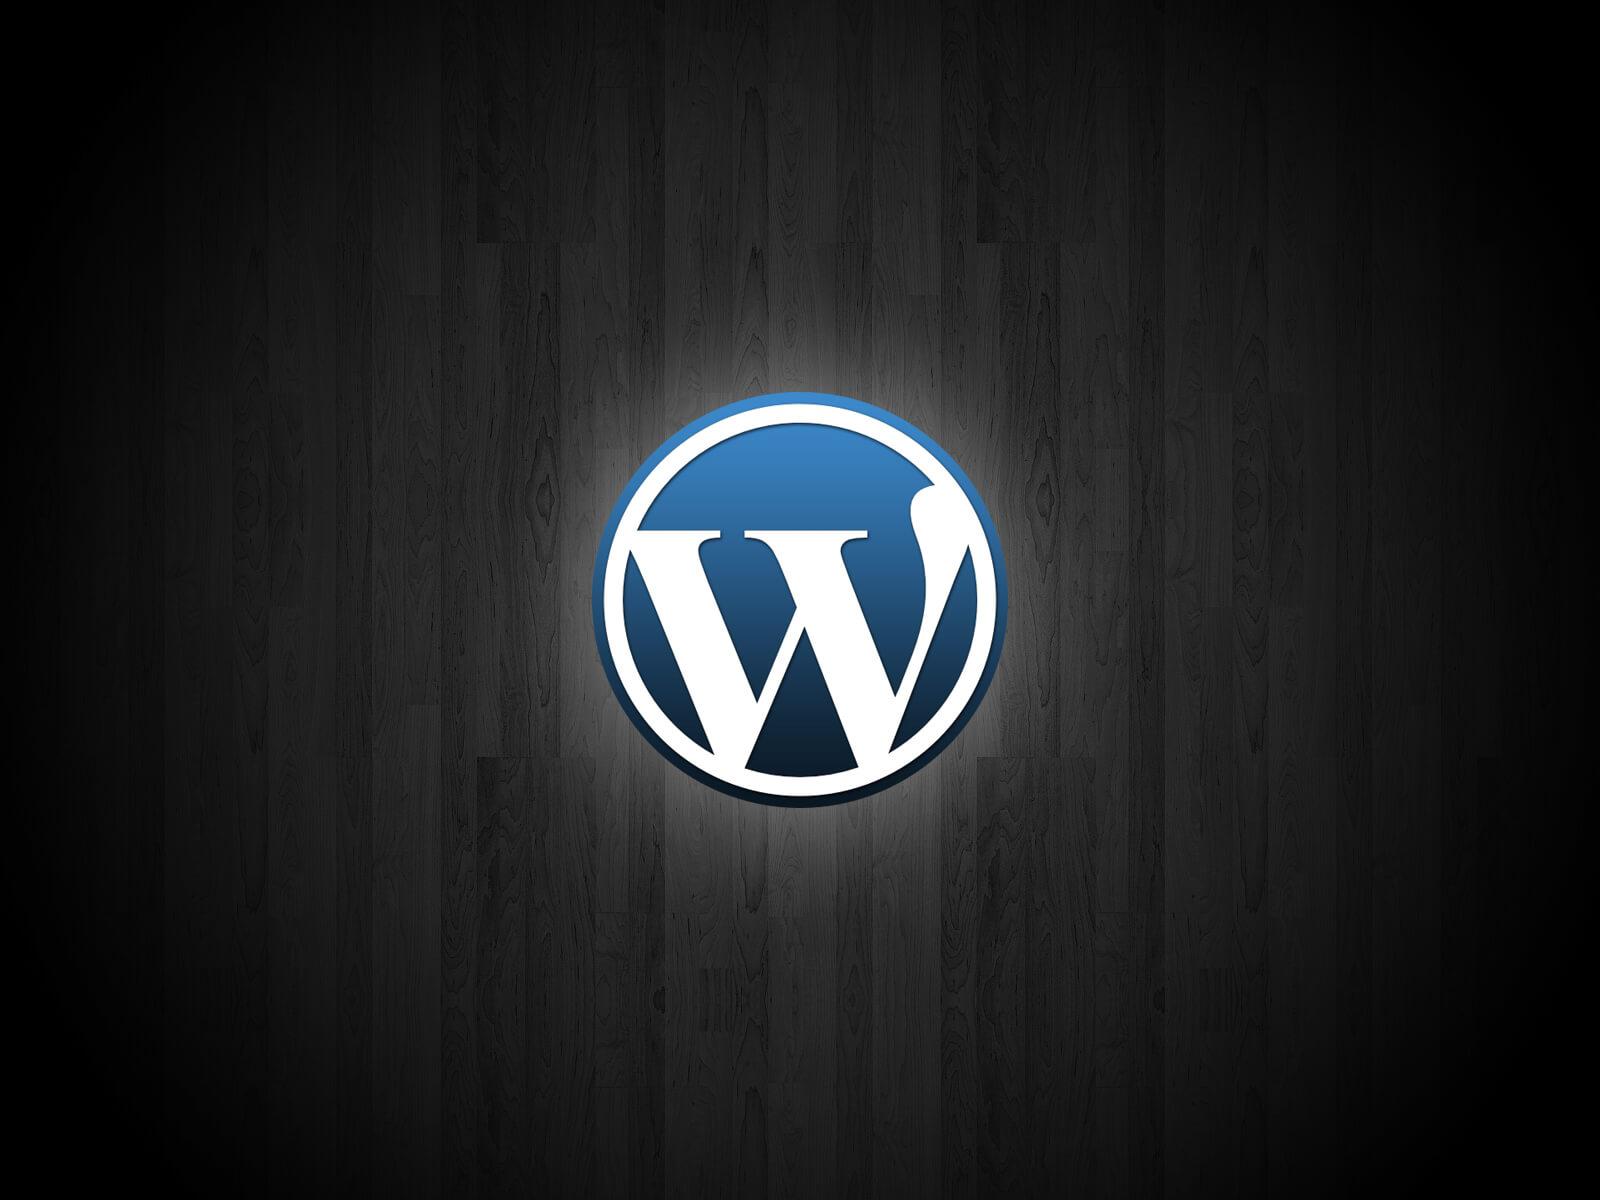 wordpress wallpaper 1 - WordPress WallPapers